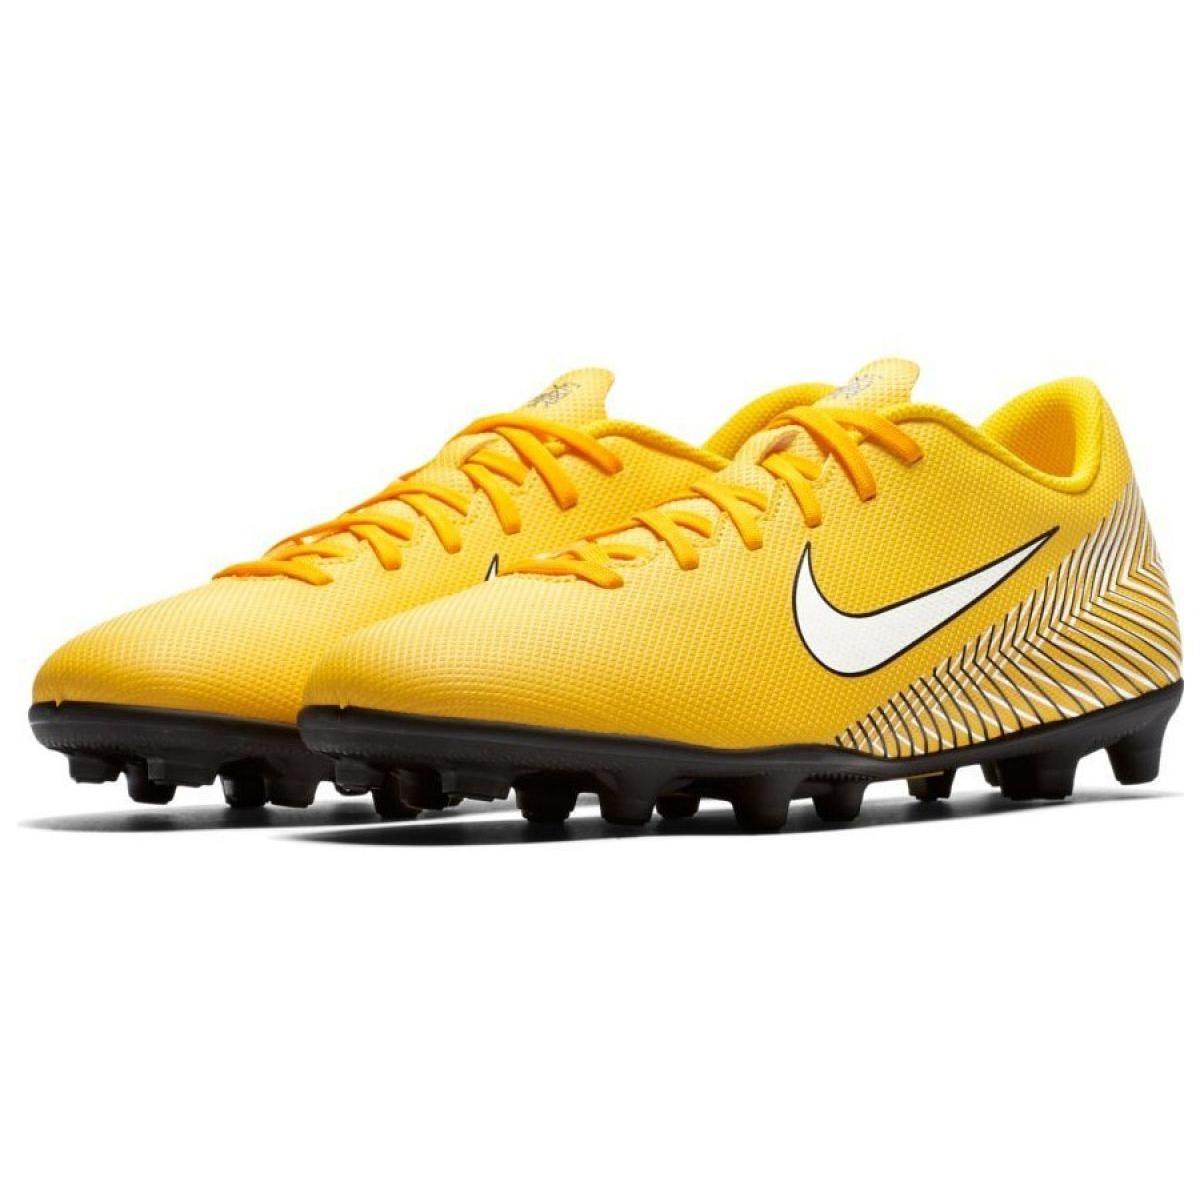 12 Neymar Mercurial Club De Chaussures M Vapor Mg 710 Nike Ao3129 Football N8wnmv0O